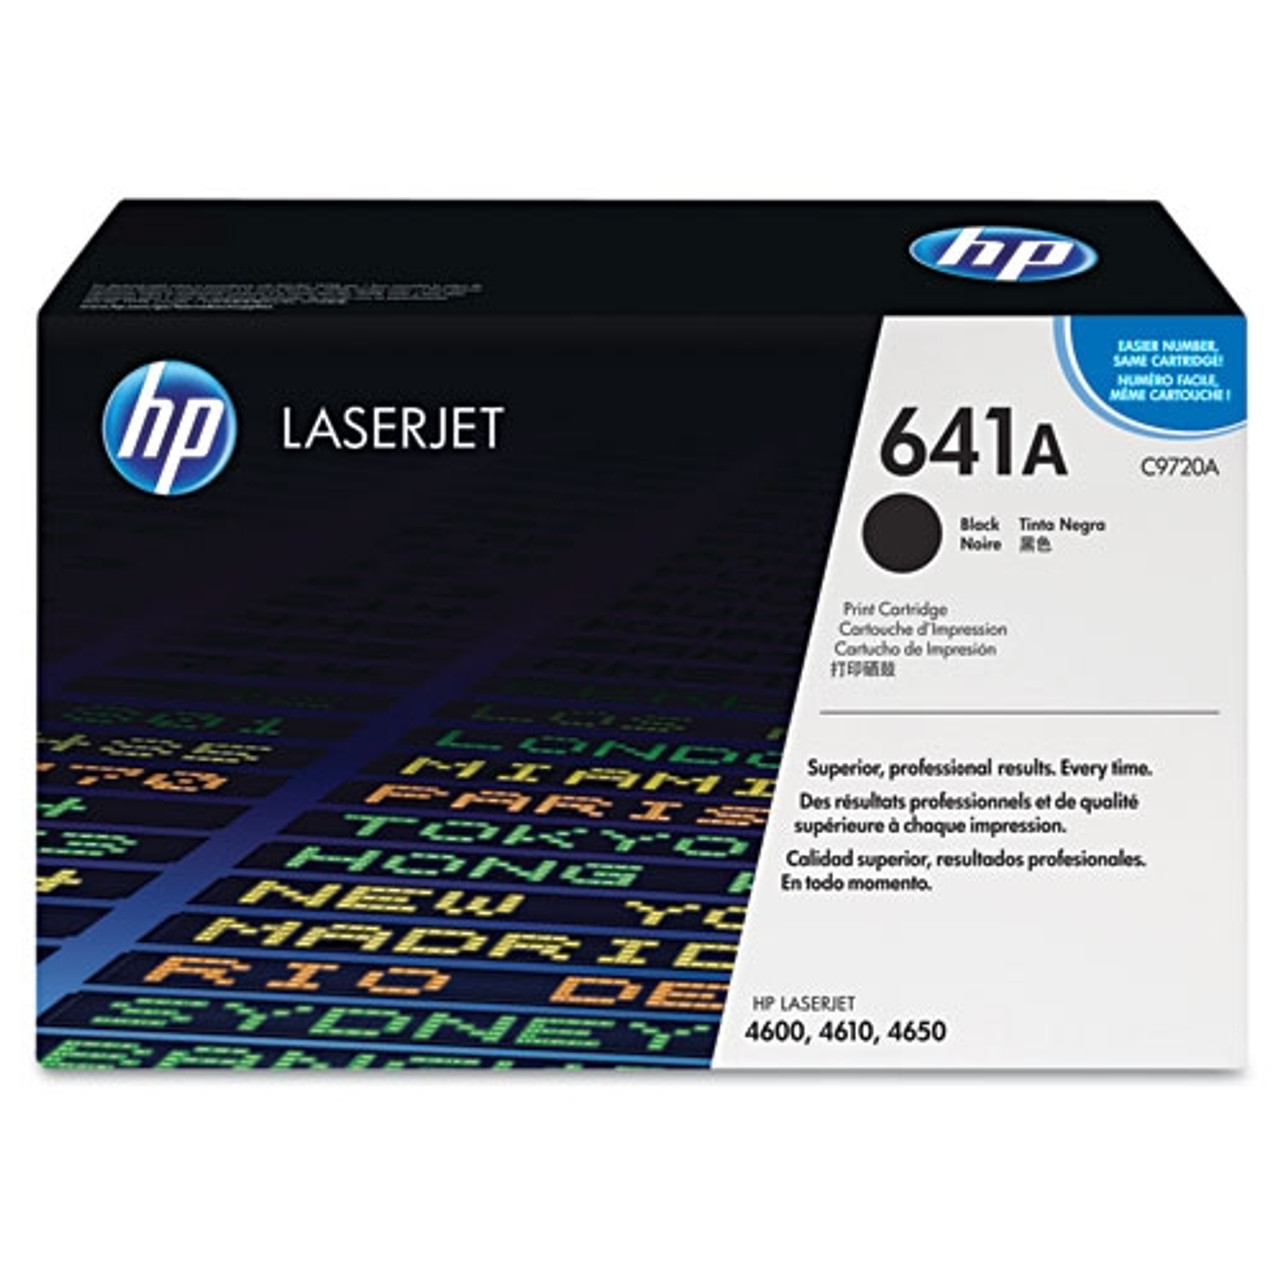 HP 4600 4650 Black Toner Cartridge - New